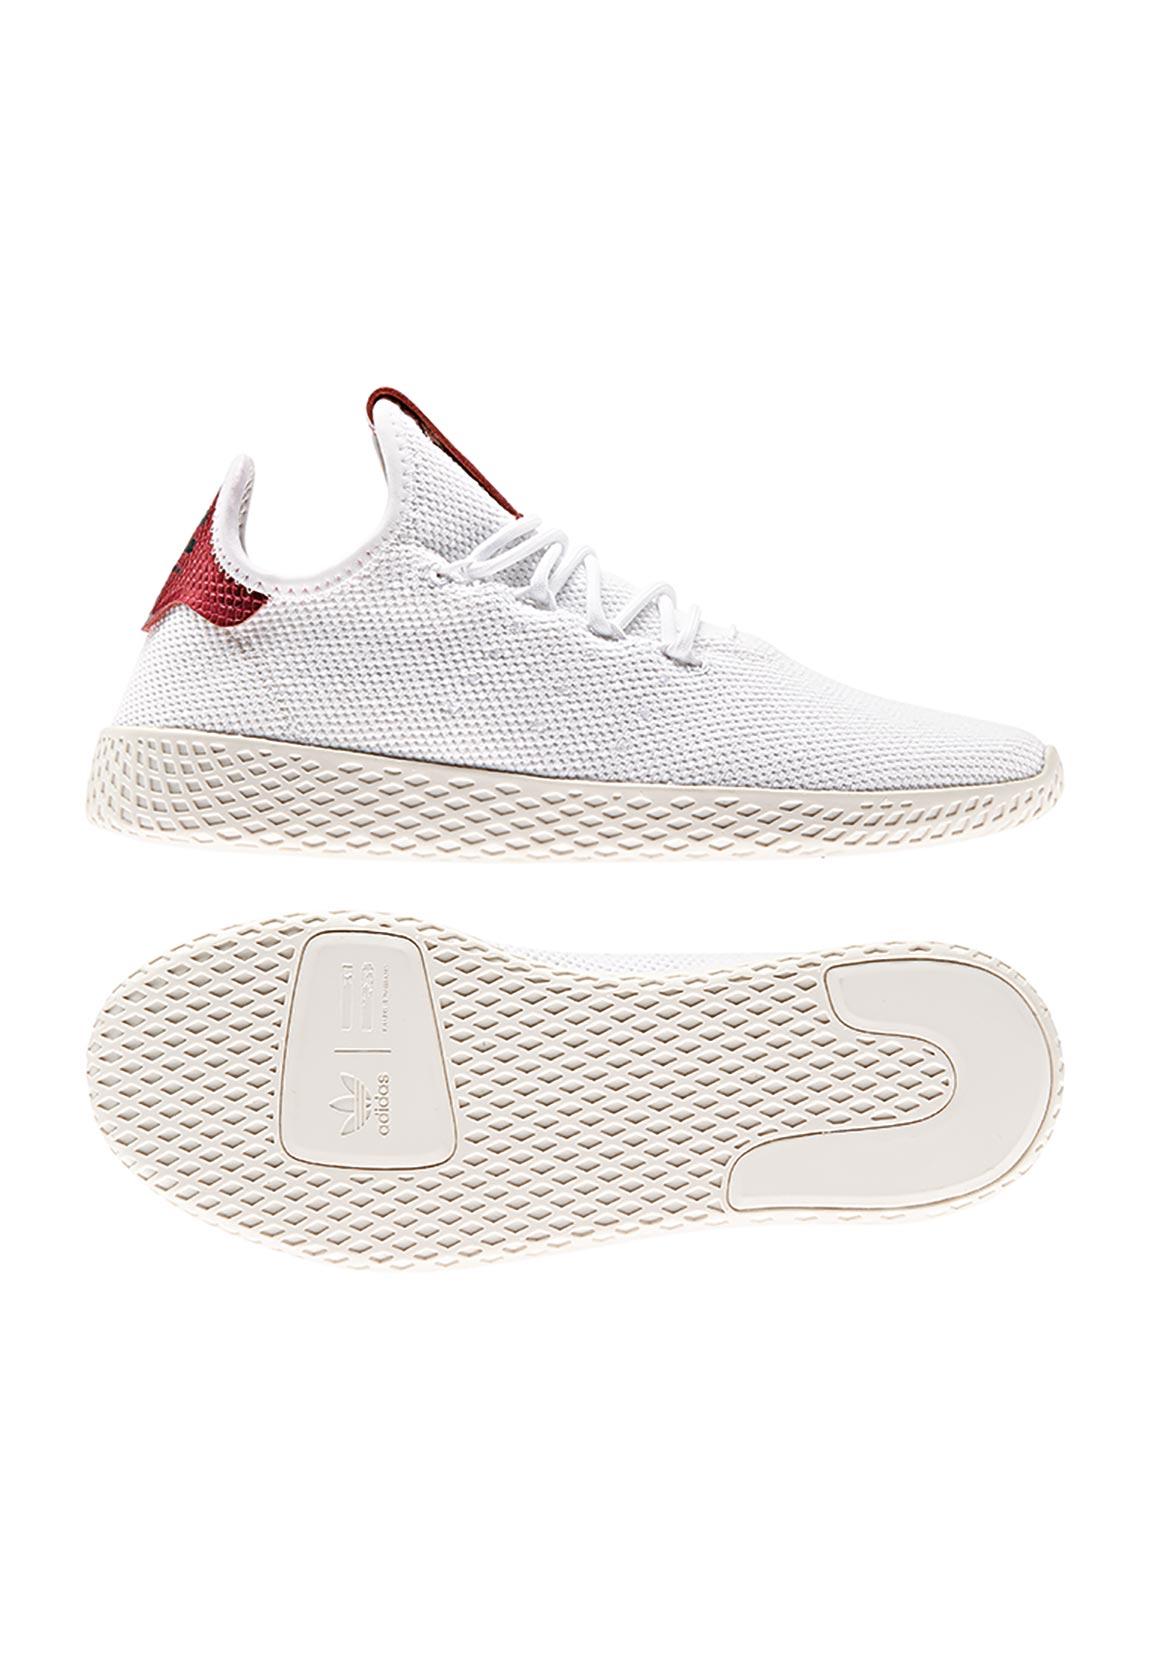 Adidas Original Sneaker PW TENNIS HU W D96443 Weiß Rot